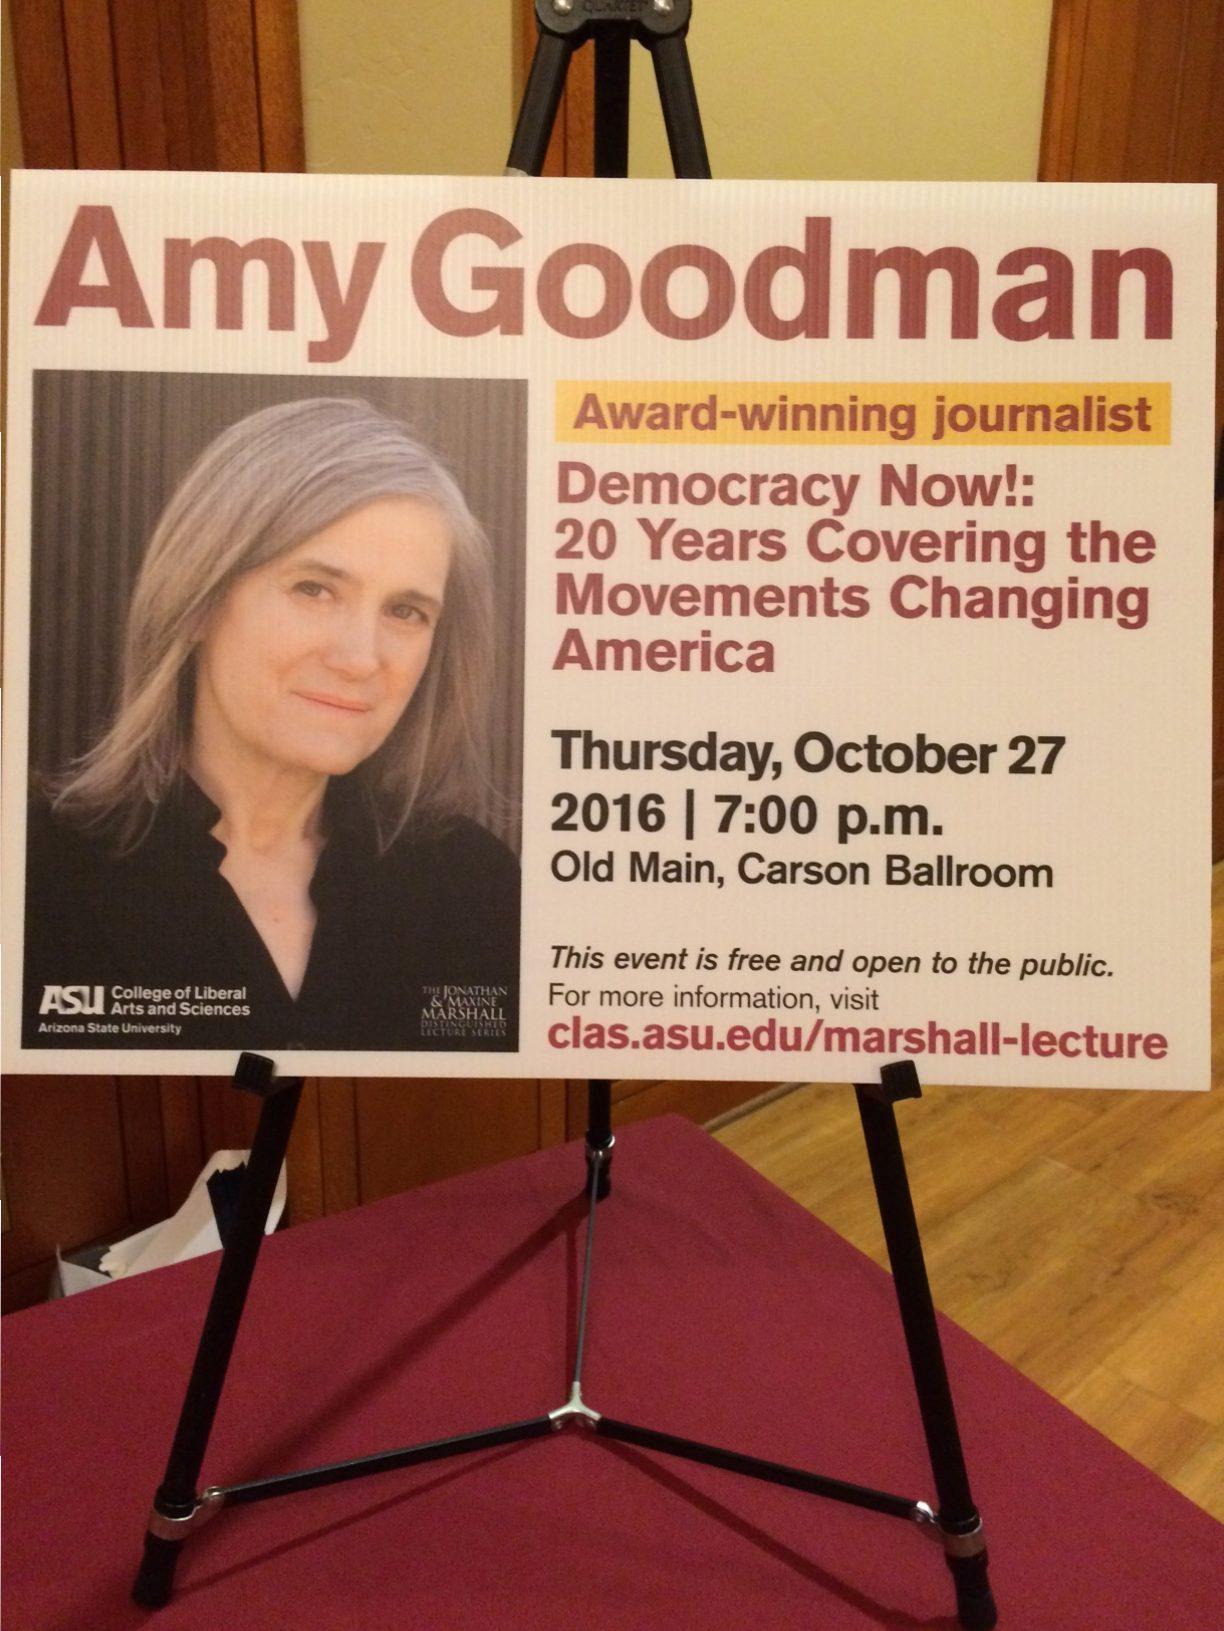 Amy Goodman spoke at ASU's Tempe campus on Thursday, Oct. 27.